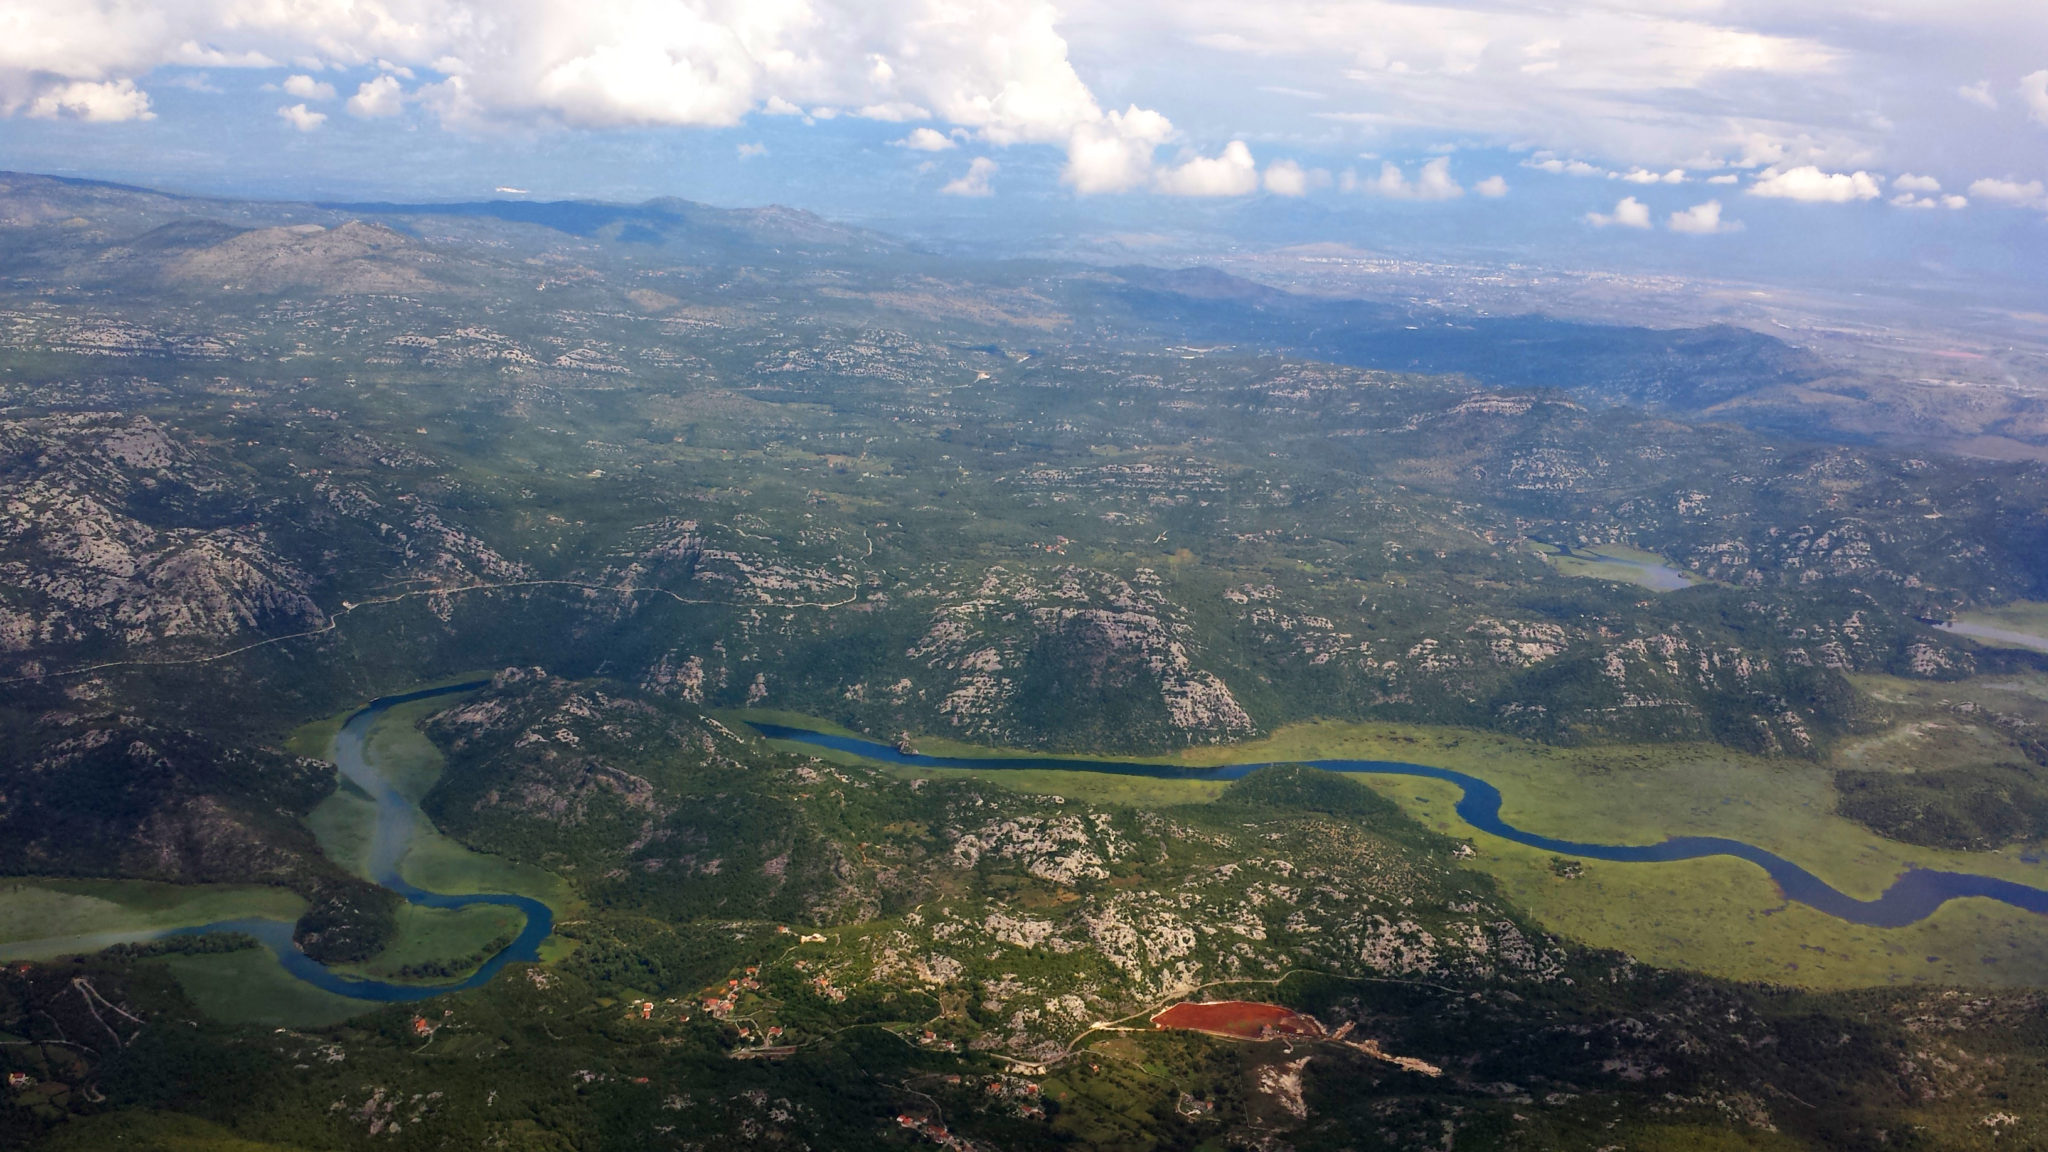 Hema_Montenegro_vue_ciel_sky_view_skadar_lake2